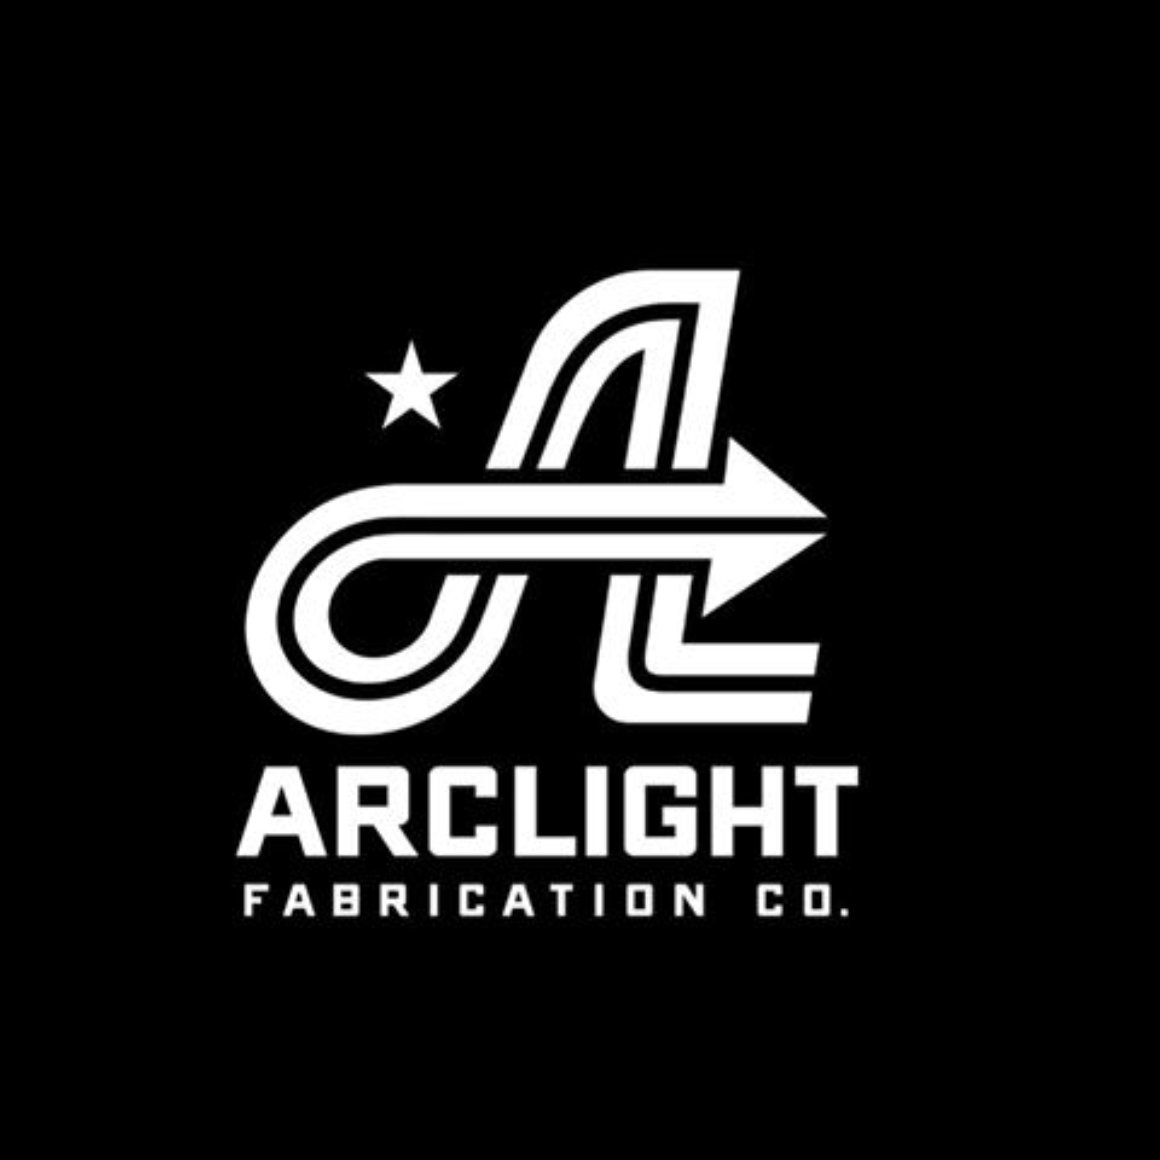 ArclightFab